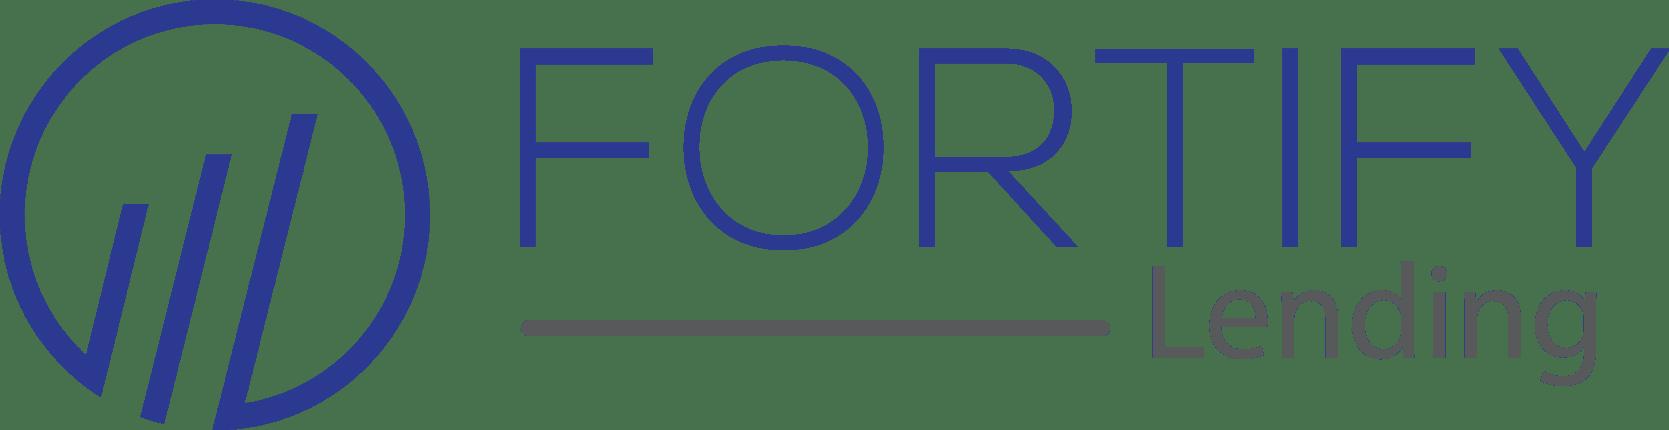 Fortify Lending